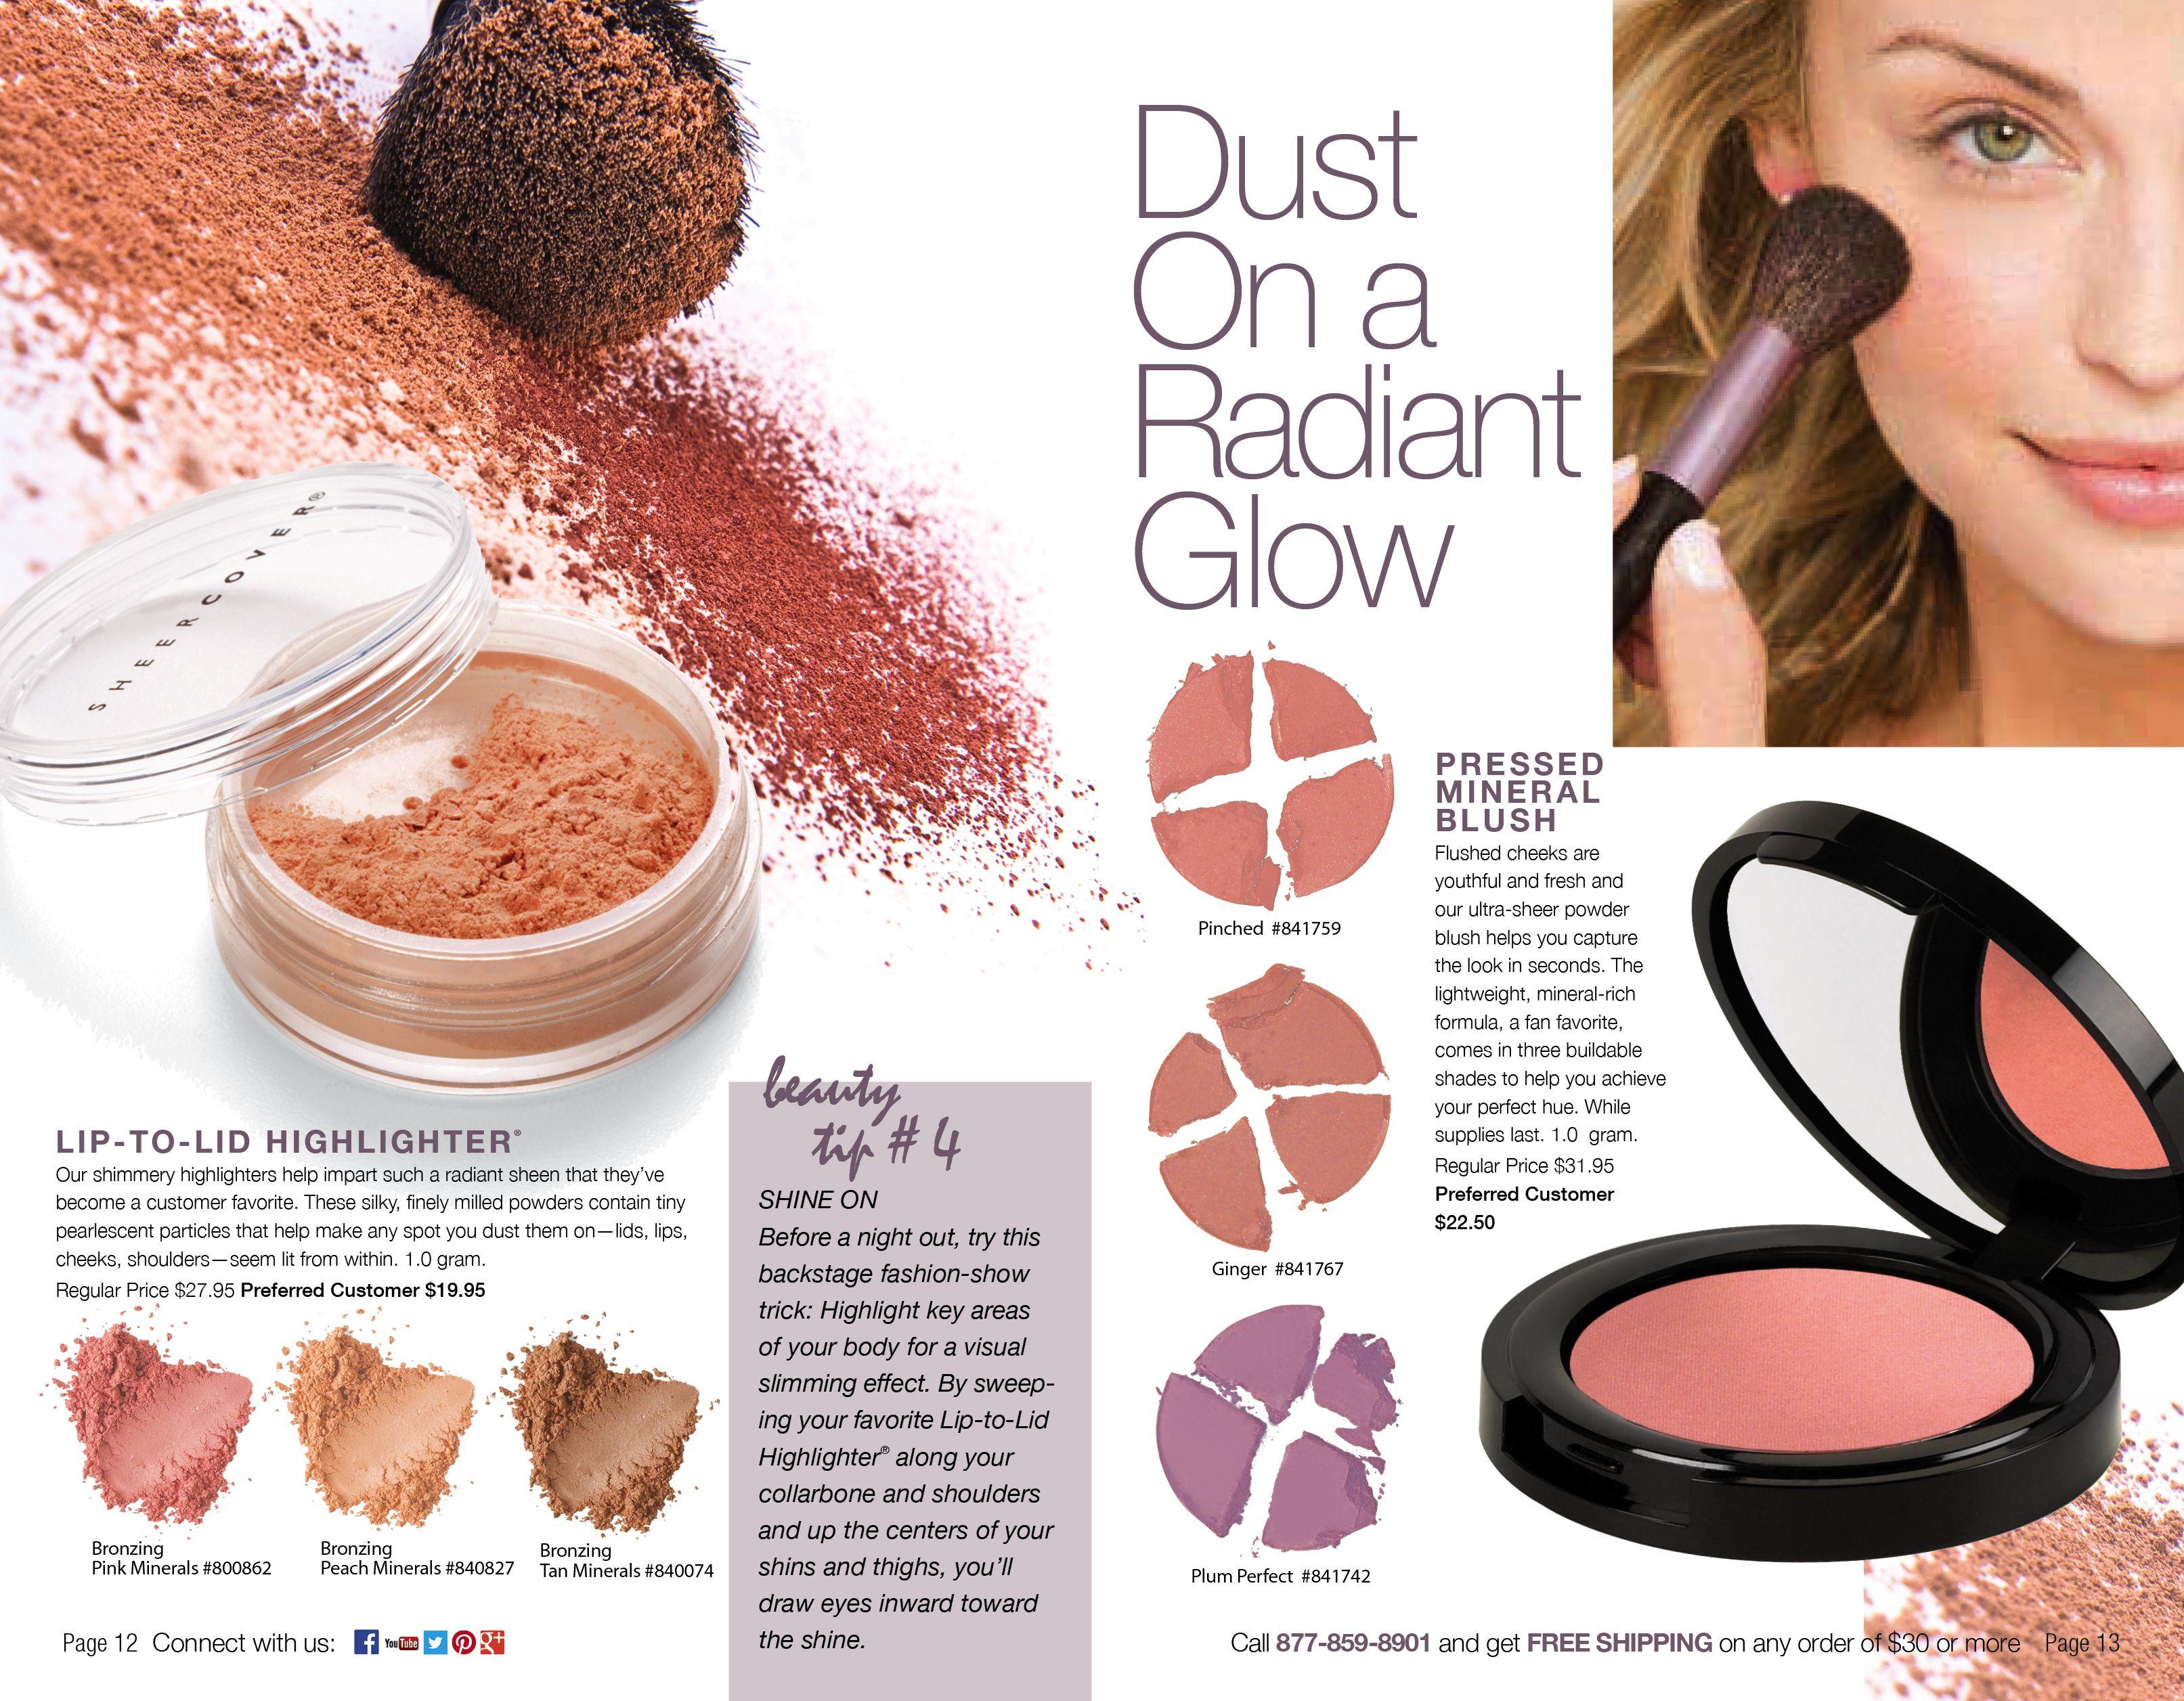 Dust on a radiant glow. Minerals makeup, Makeup, Makeup kit